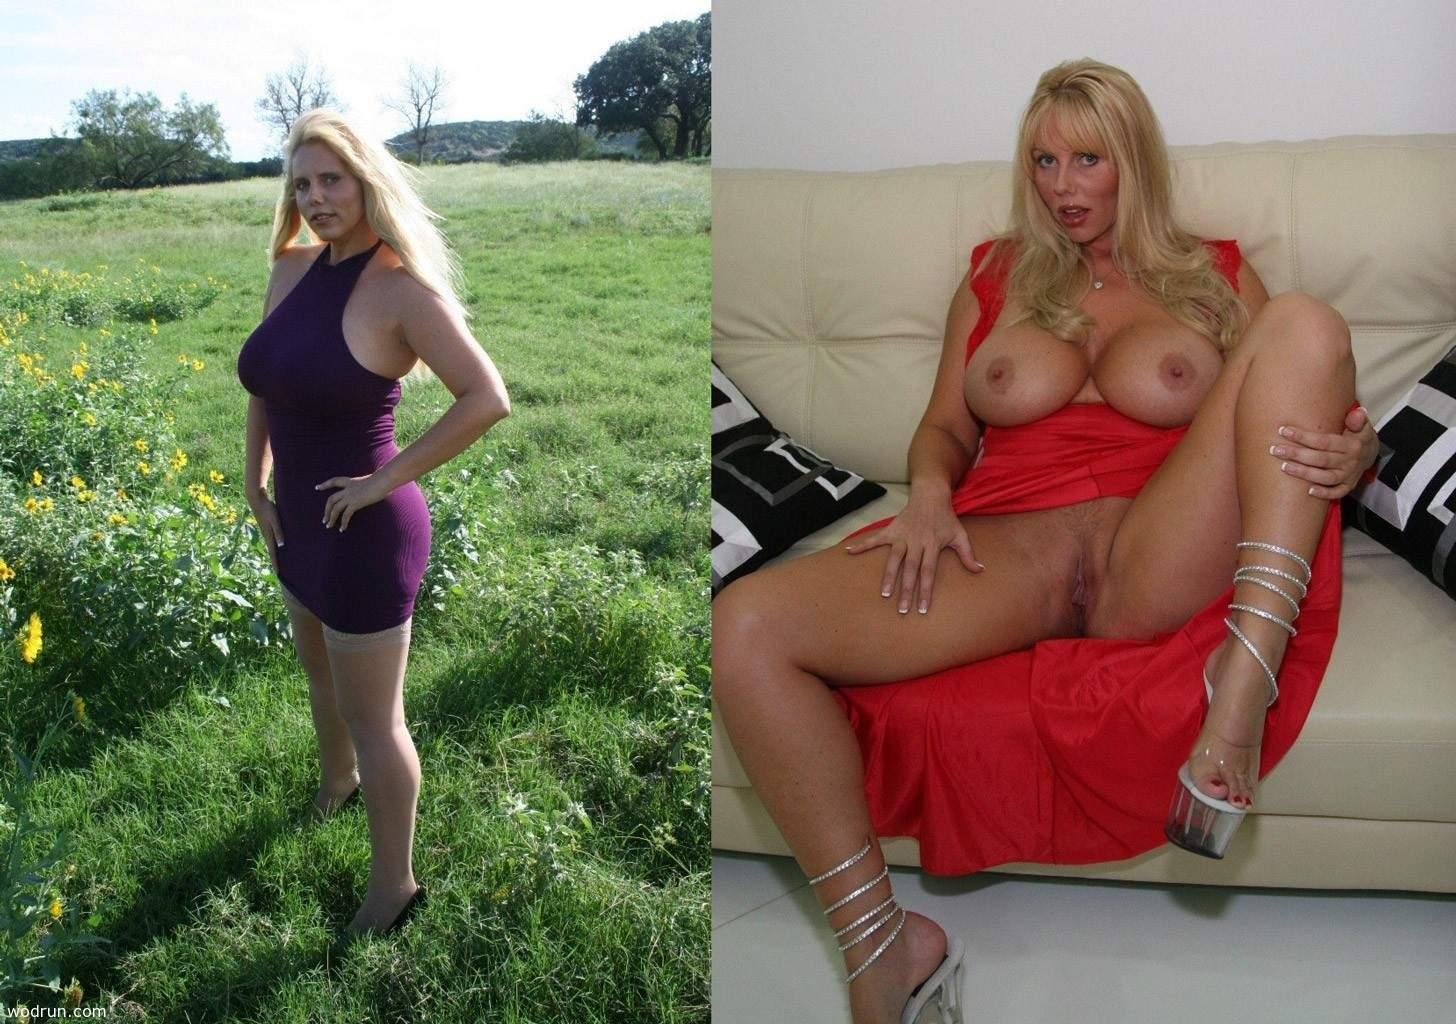 Una Madura Voluptuosa Y Desnuda Chicas Desnudas